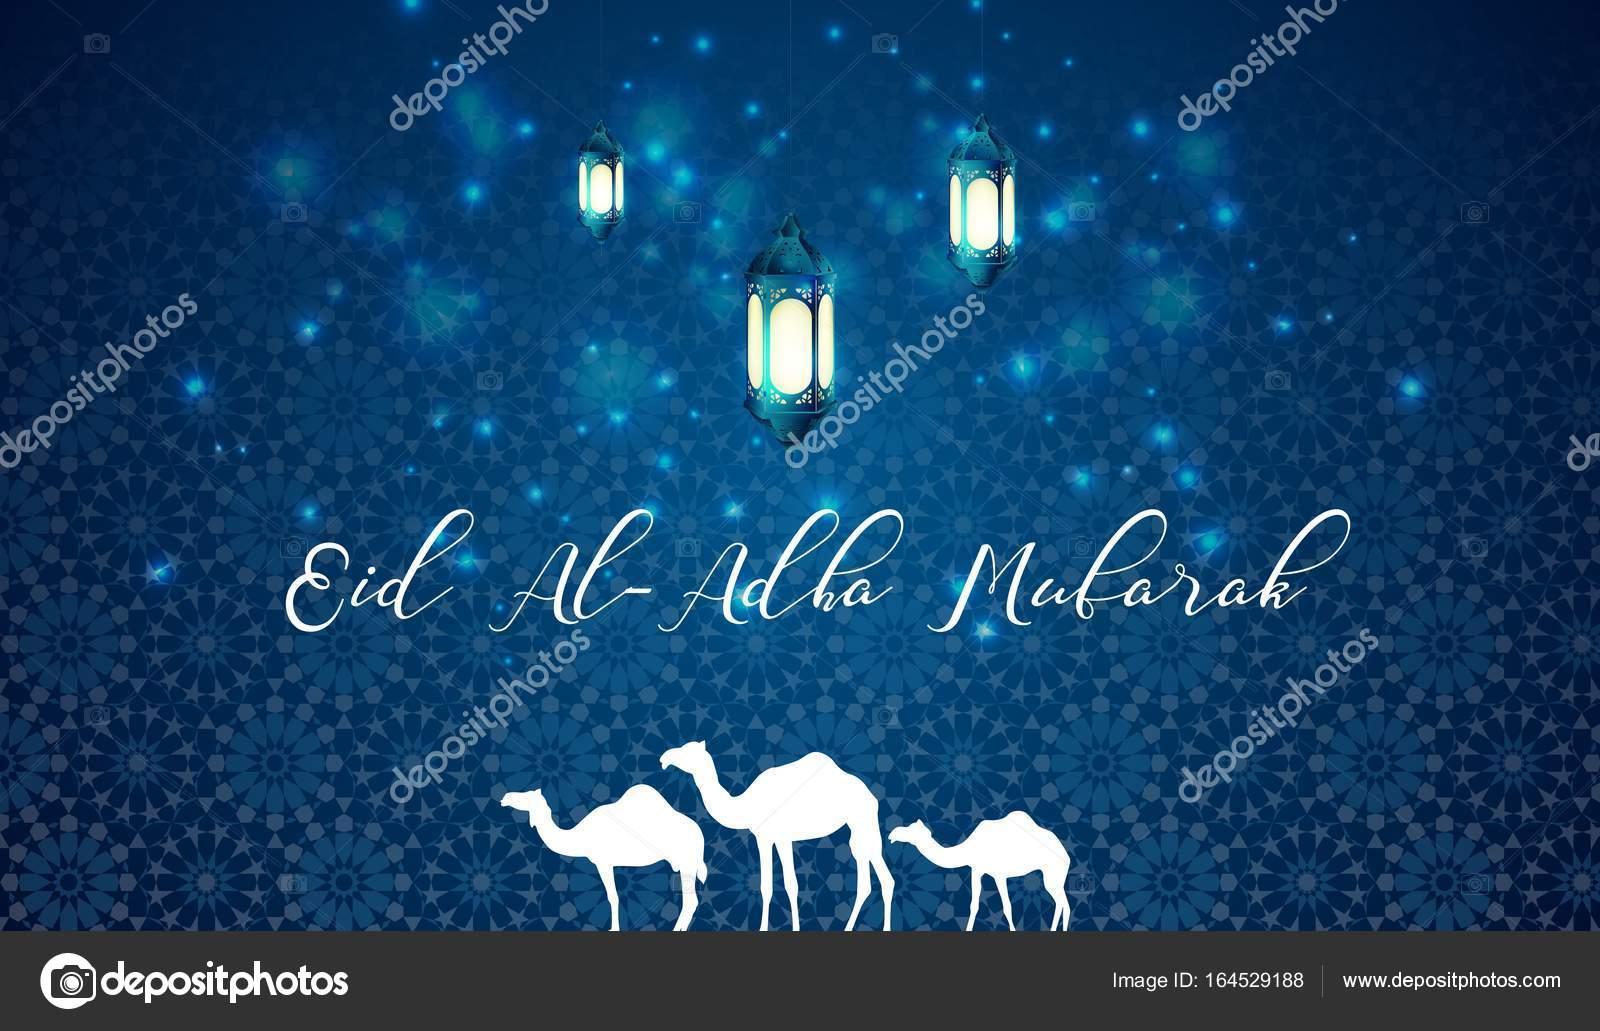 Eid Al Adha Blue Greeting Background With Arabic Lantern And Camels